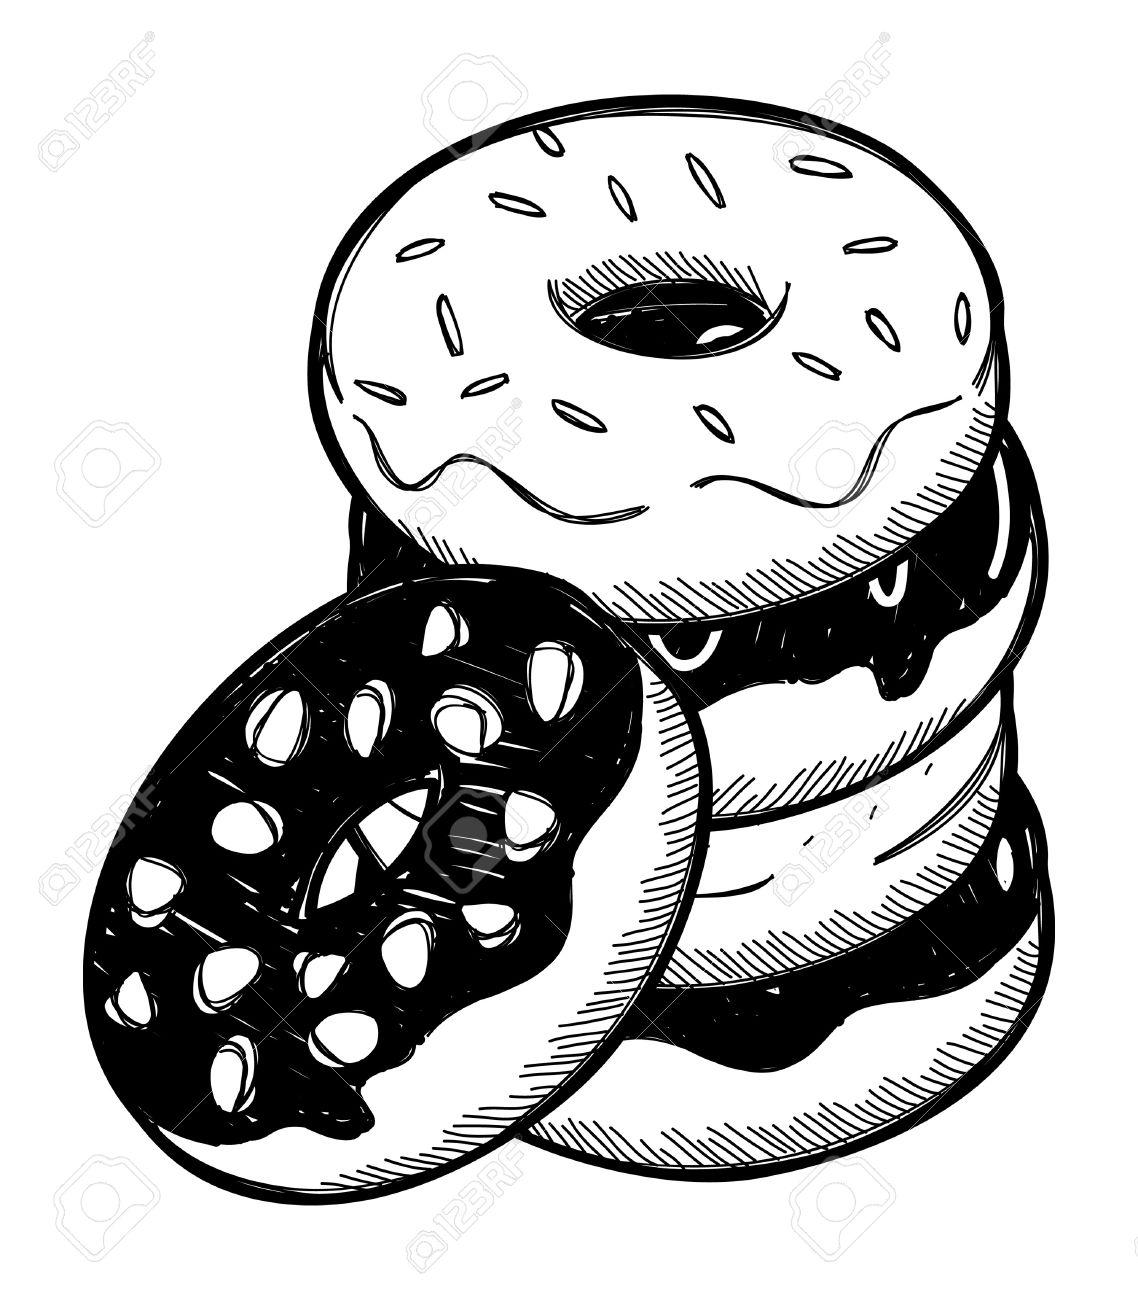 Donut Drawing At GetDrawings